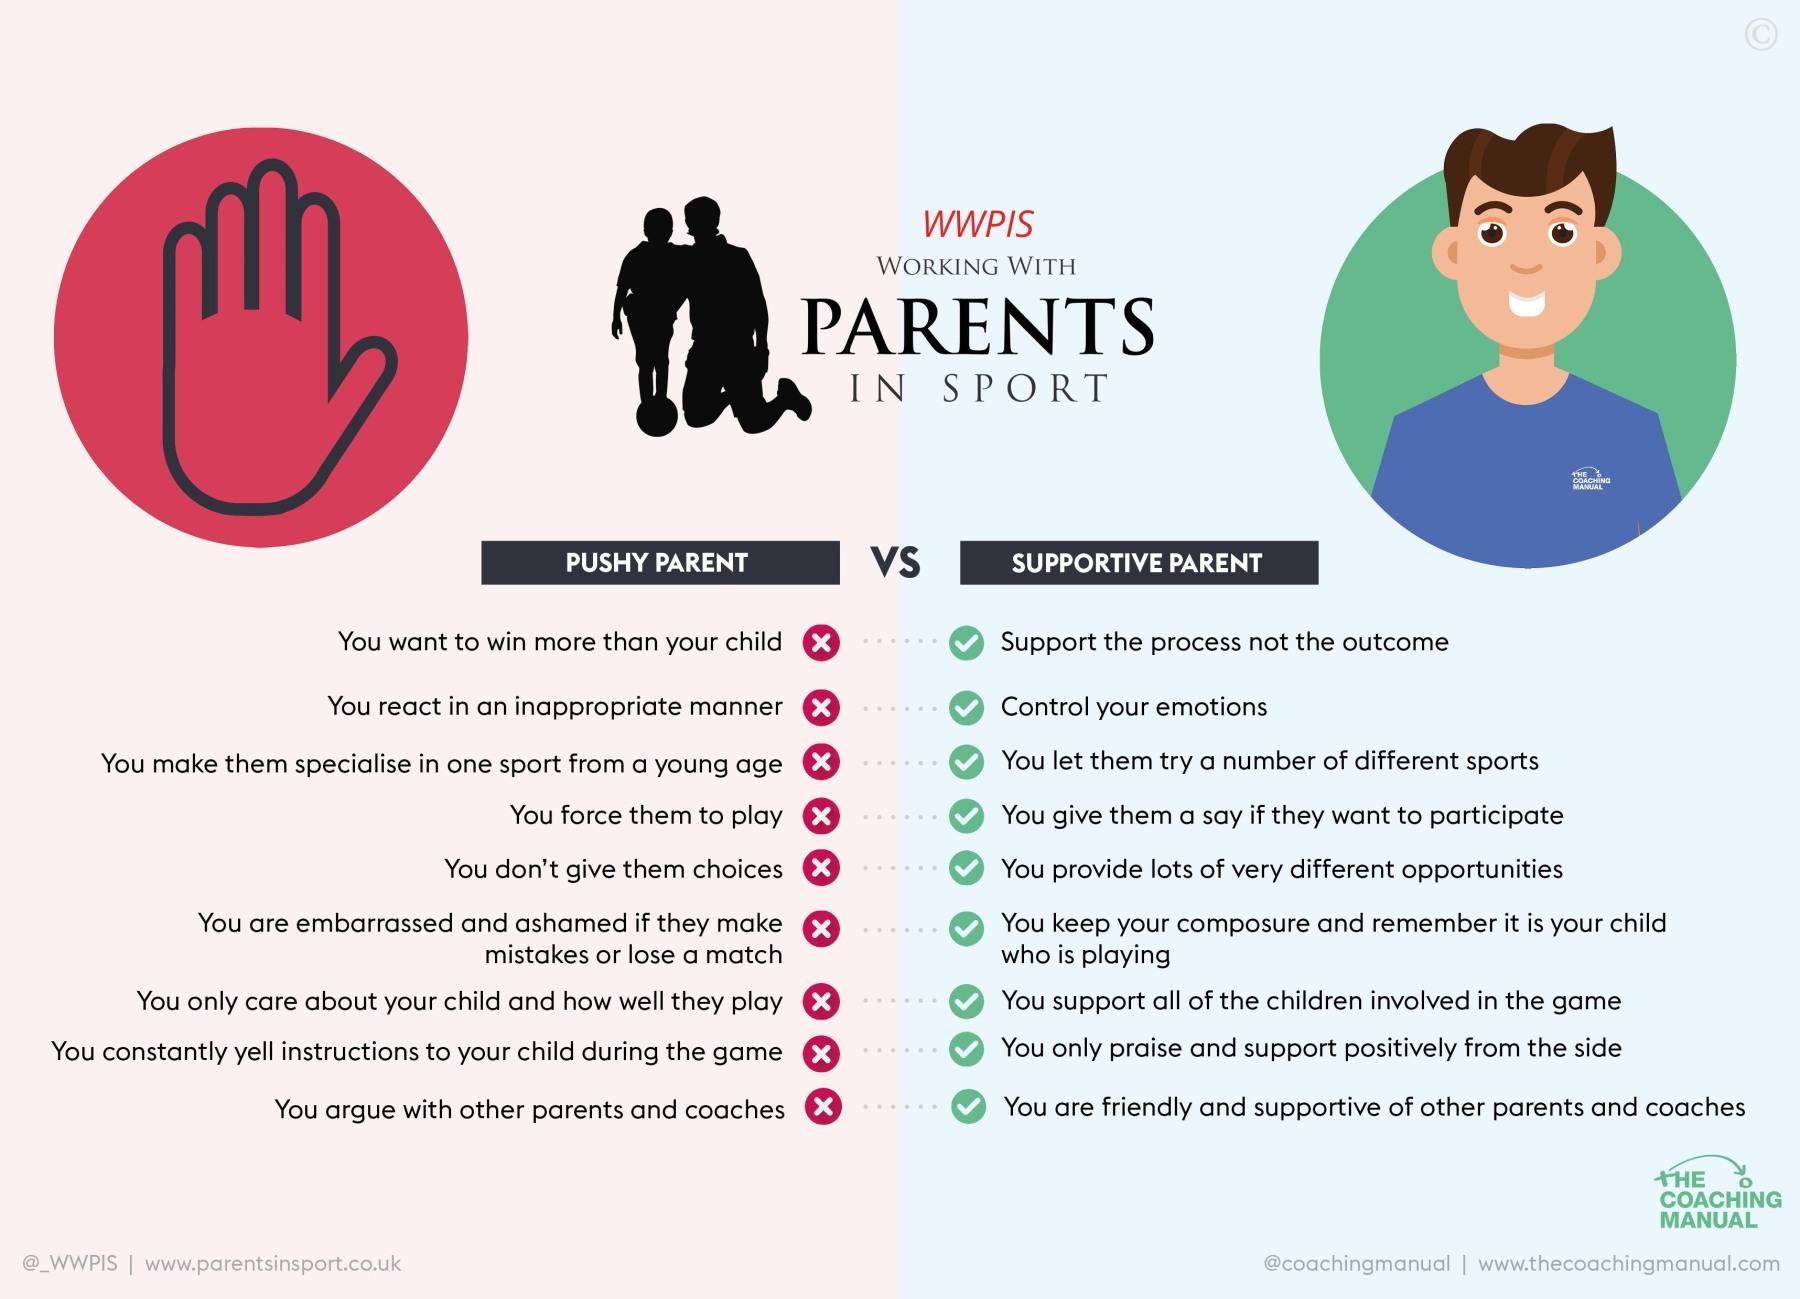 parent handbook for parents who want